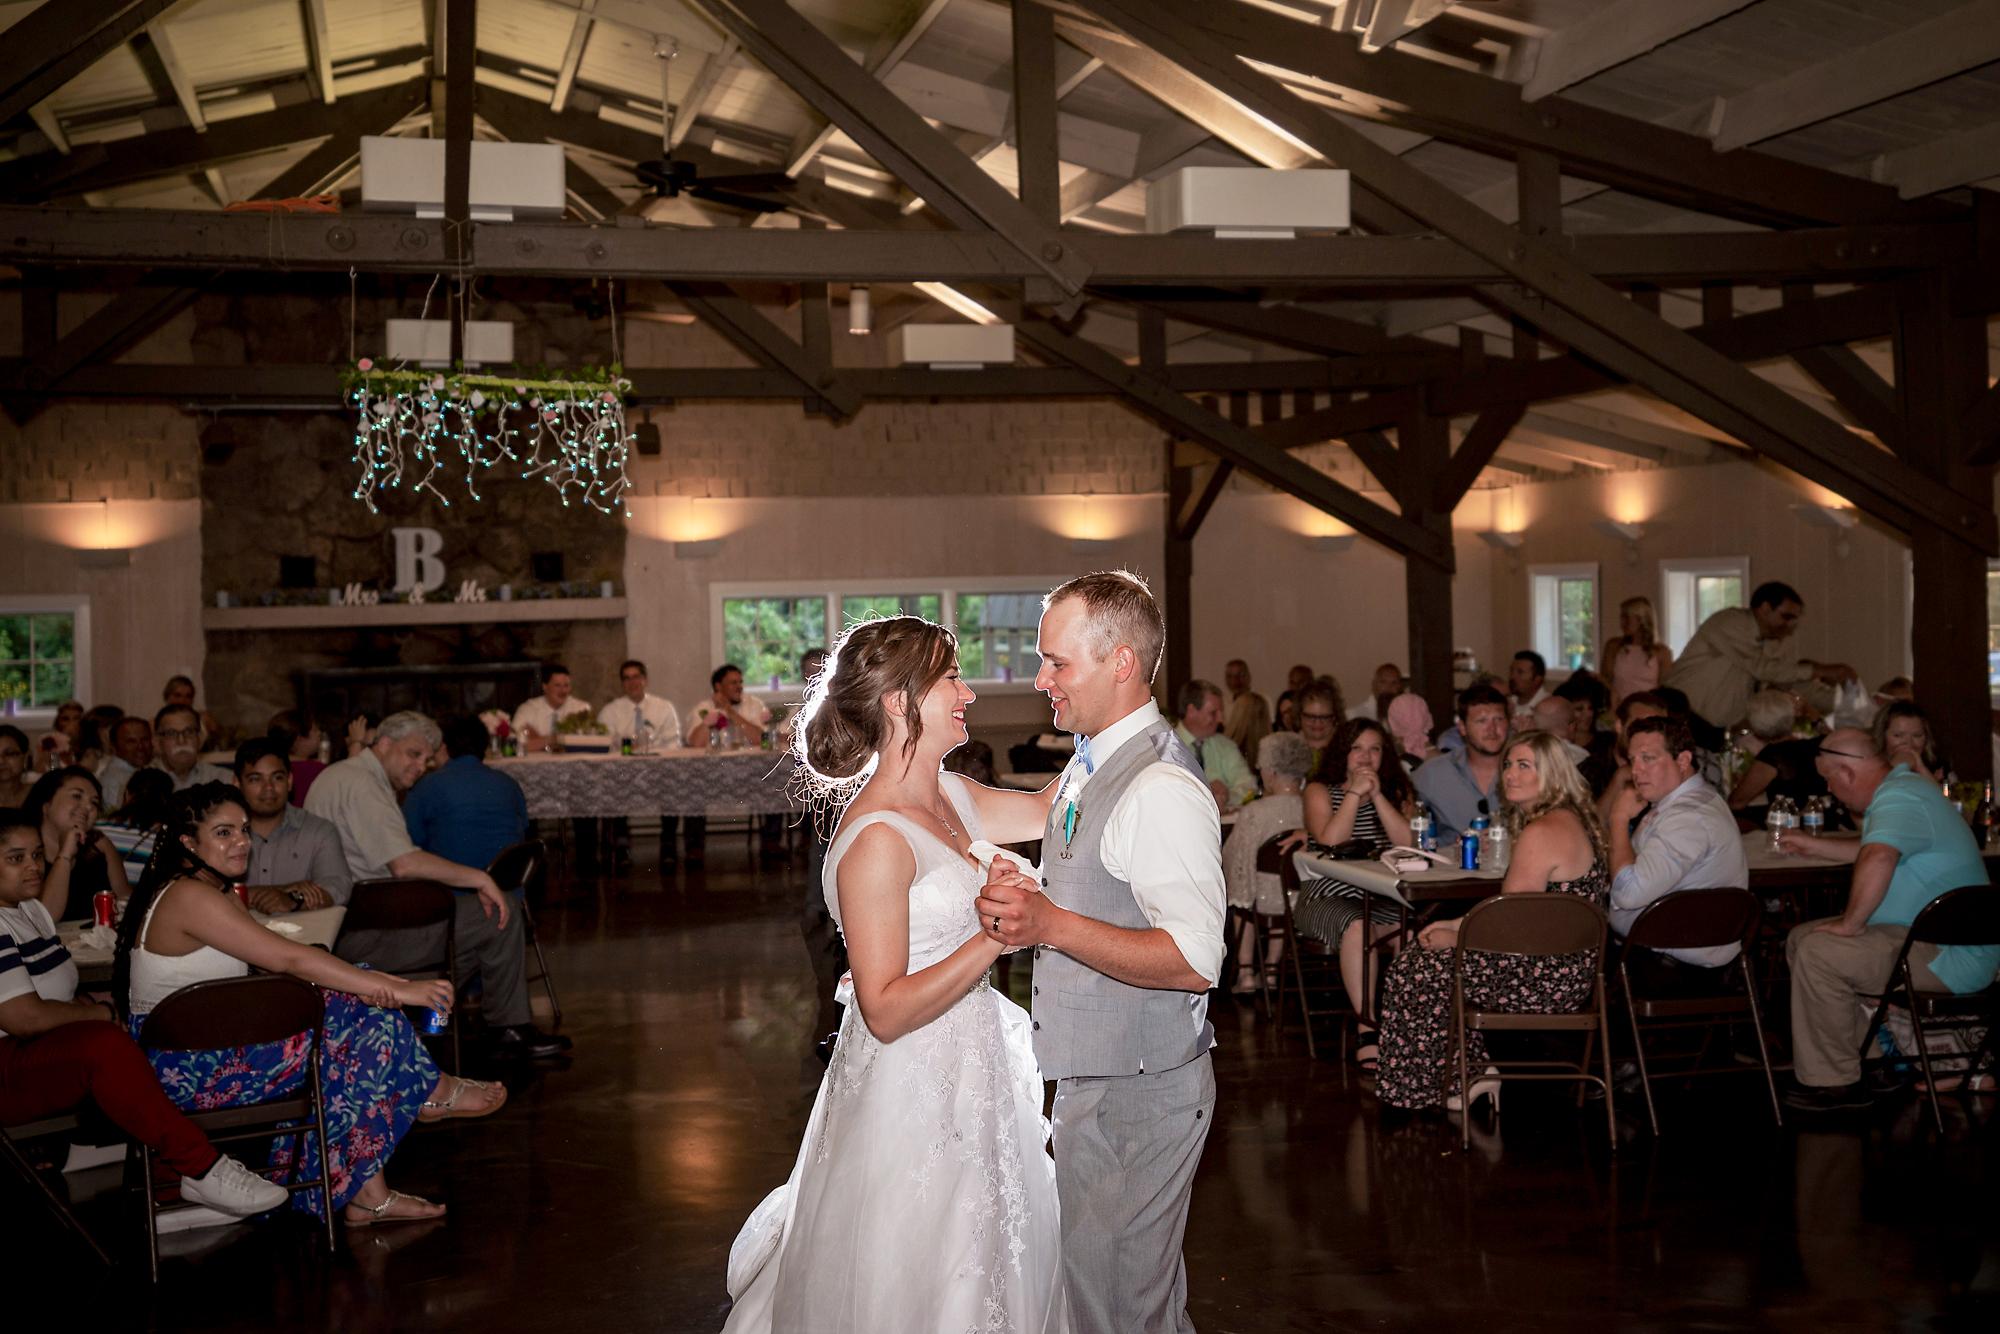 Pattison-Park-Lodge-Wedding-Cincinnati-Ohio-Photographer-26.jpg